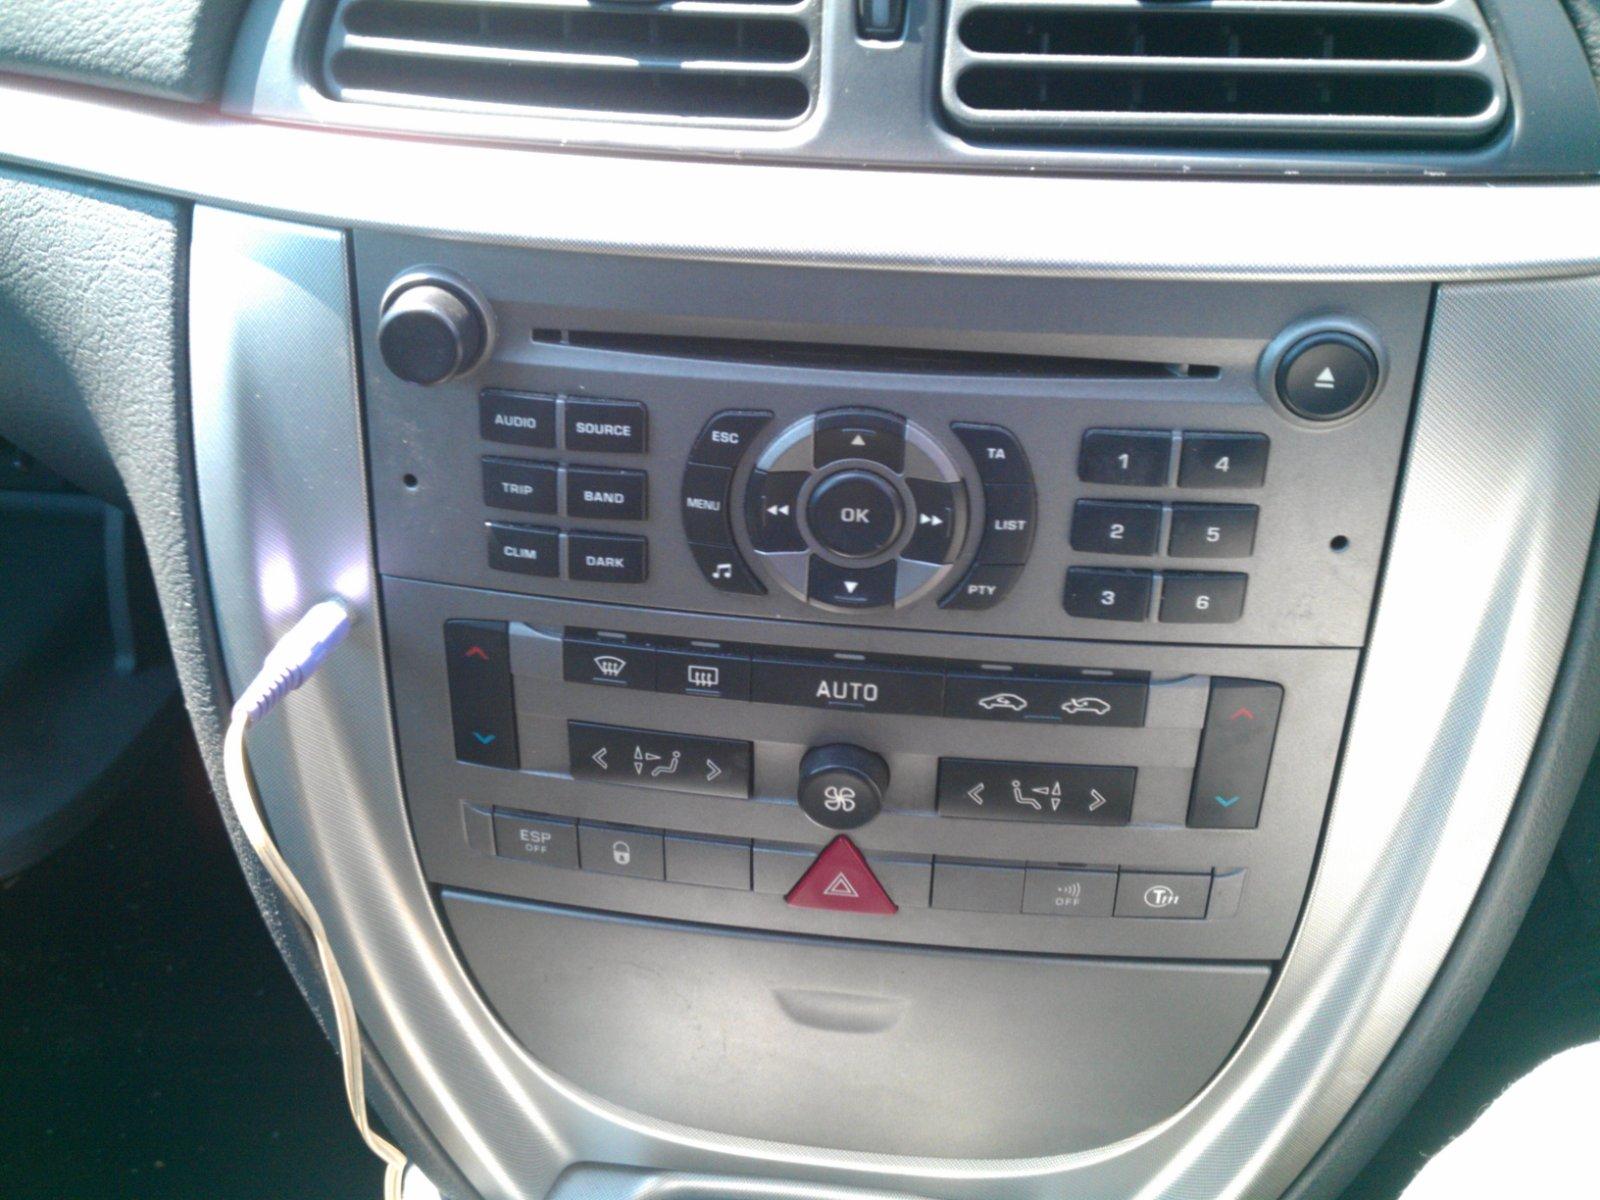 2006 Citroen C5 audio system - French Car Forum